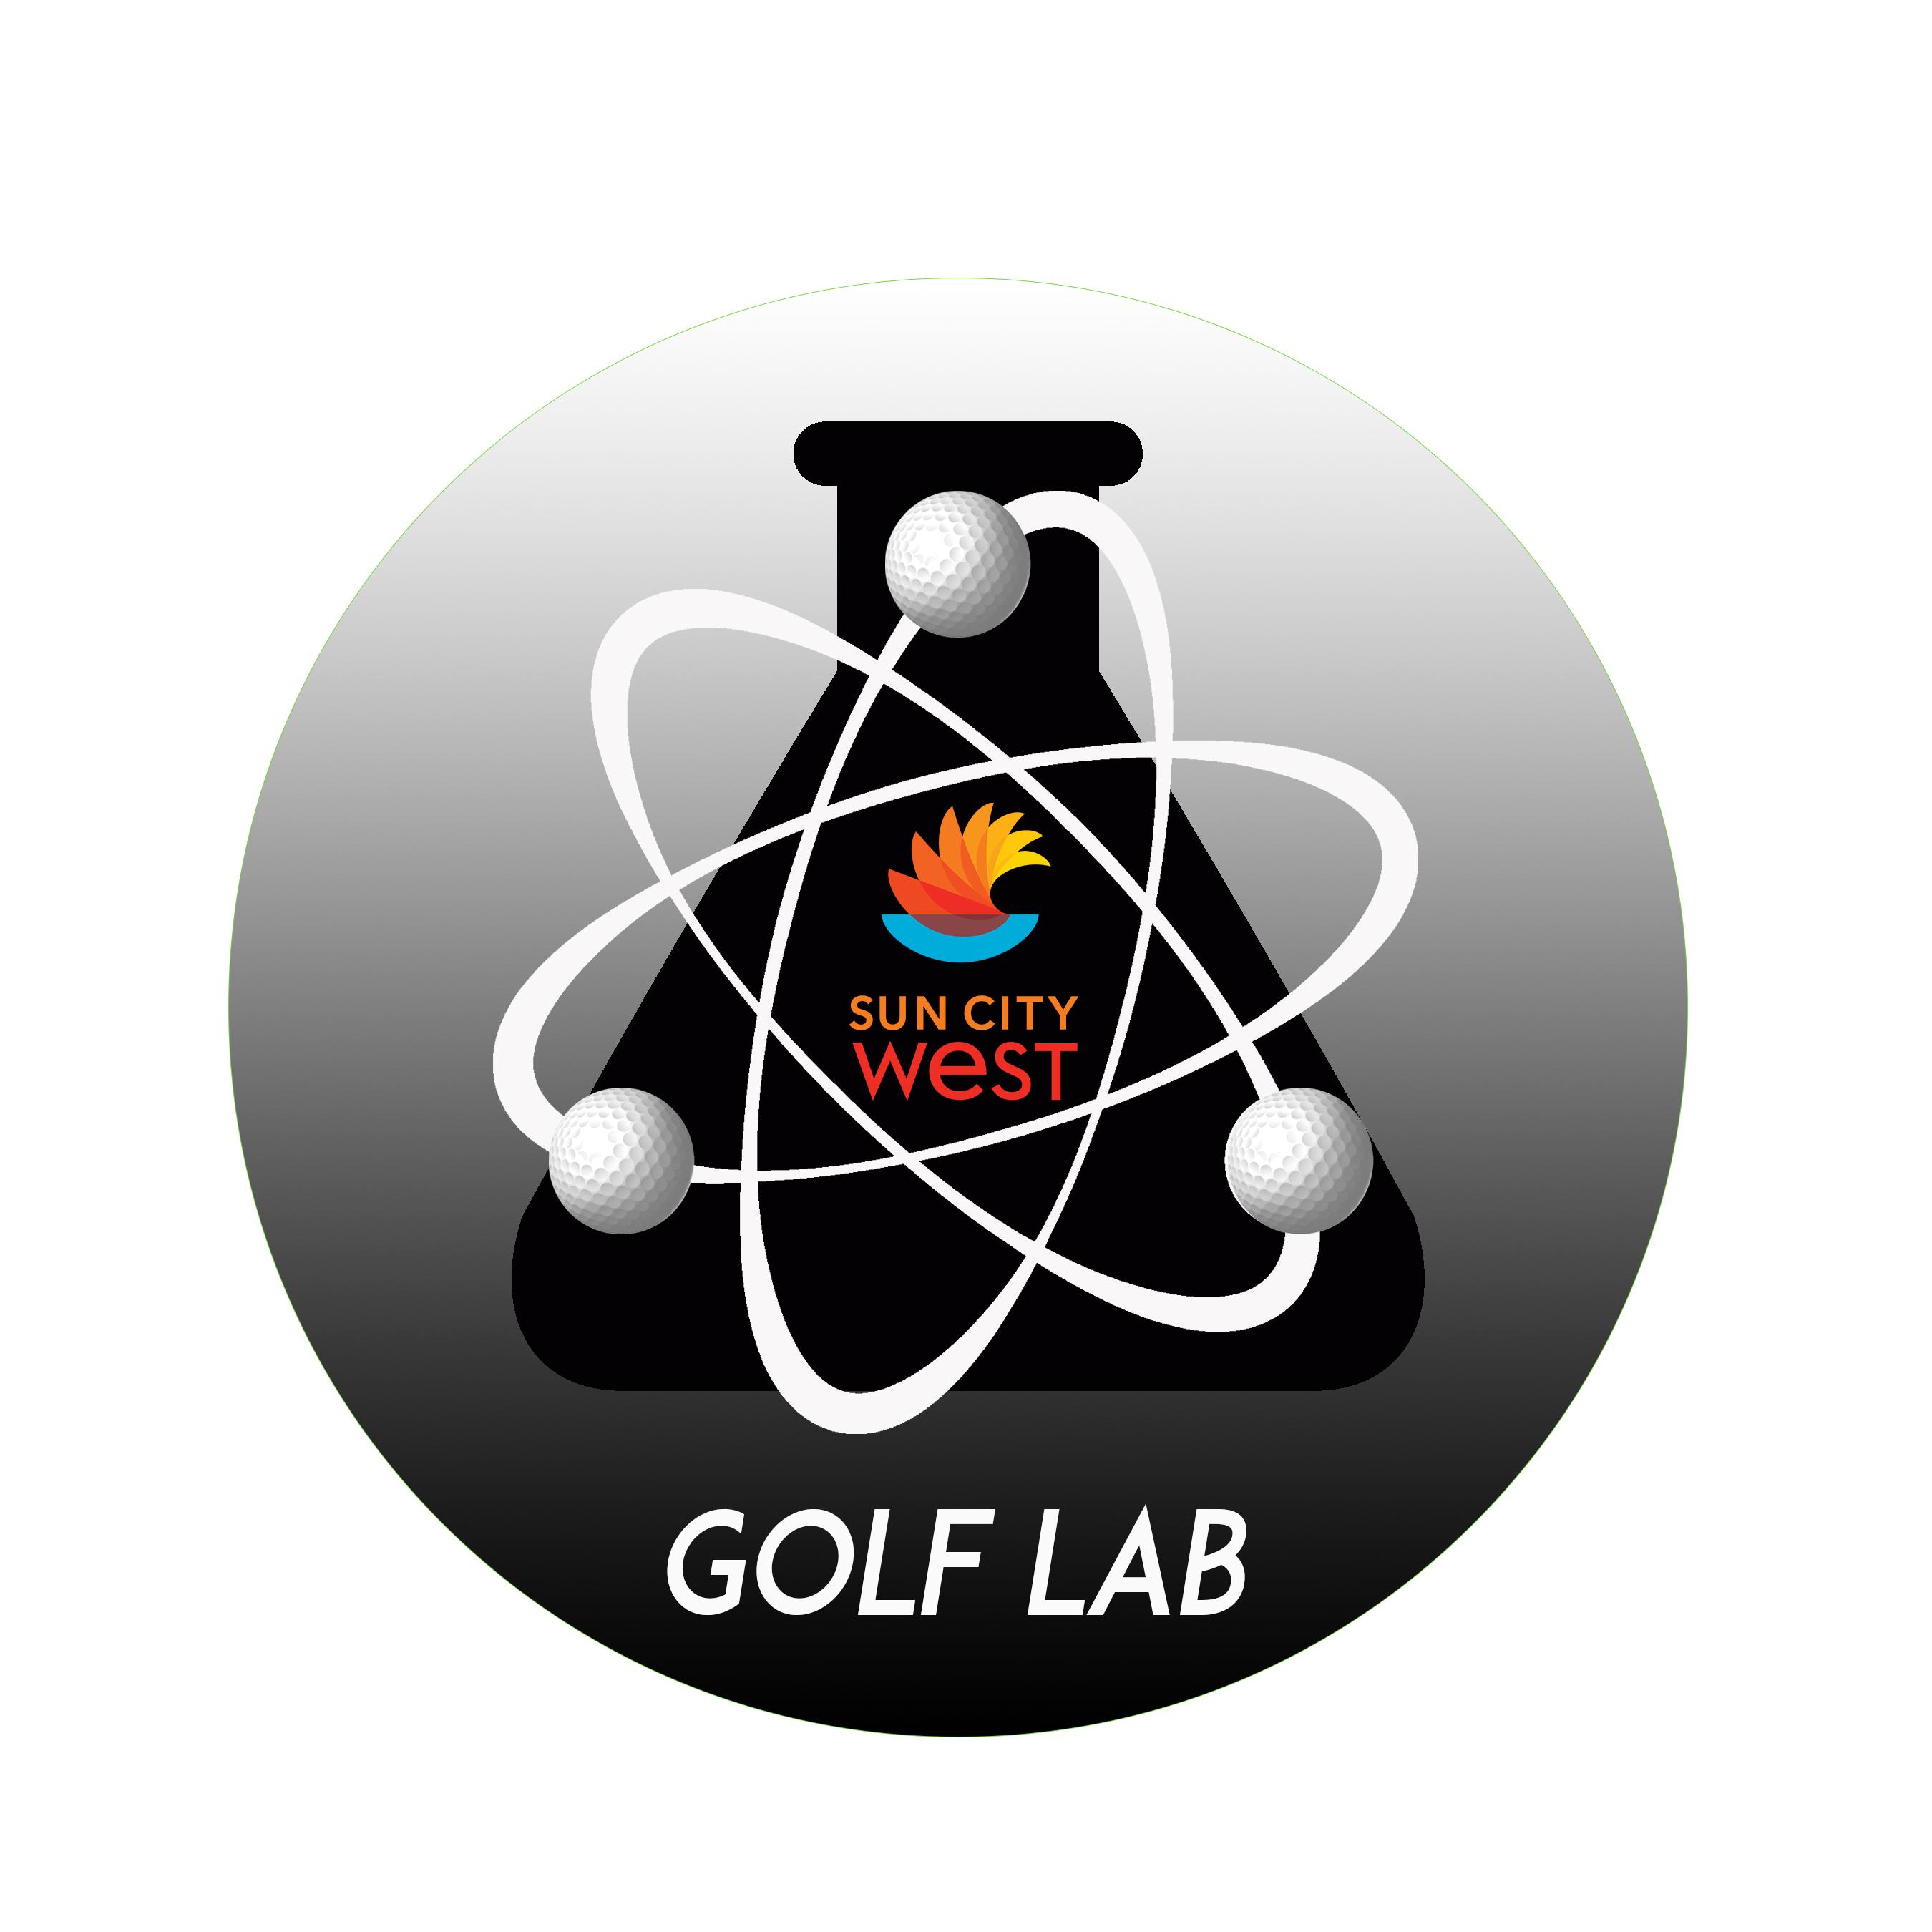 Sun City West Golf Lab